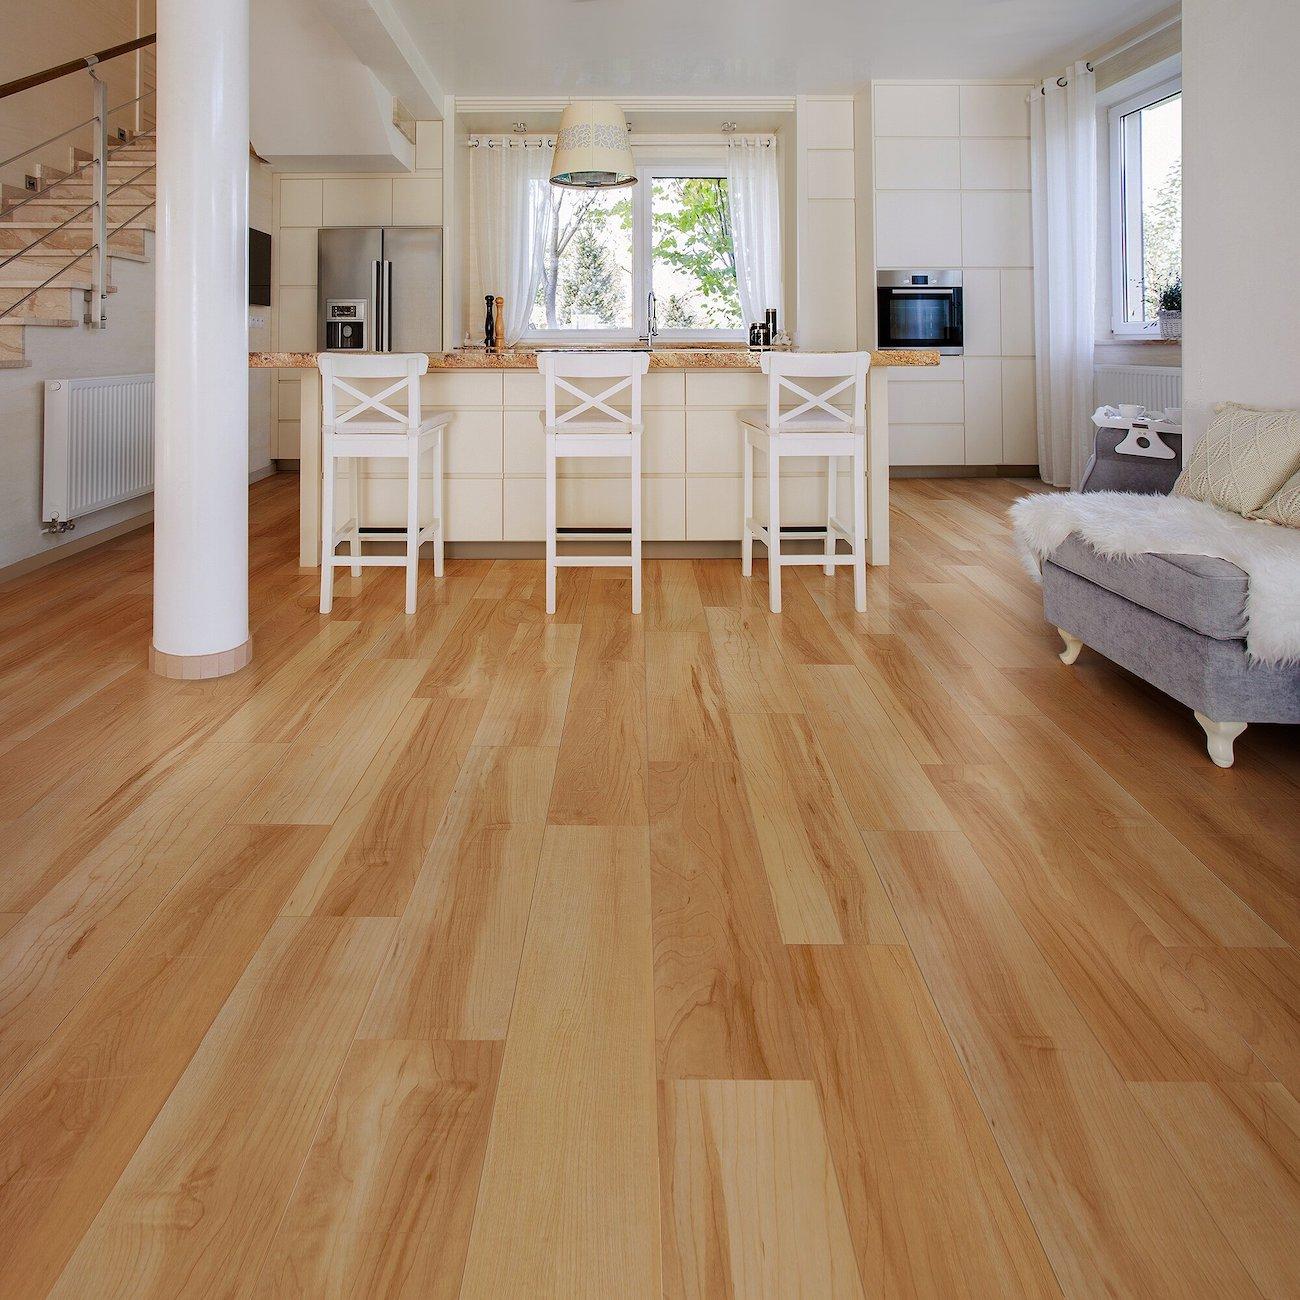 Allure Ultra Oak Luxury Vinyl Plank Flooring